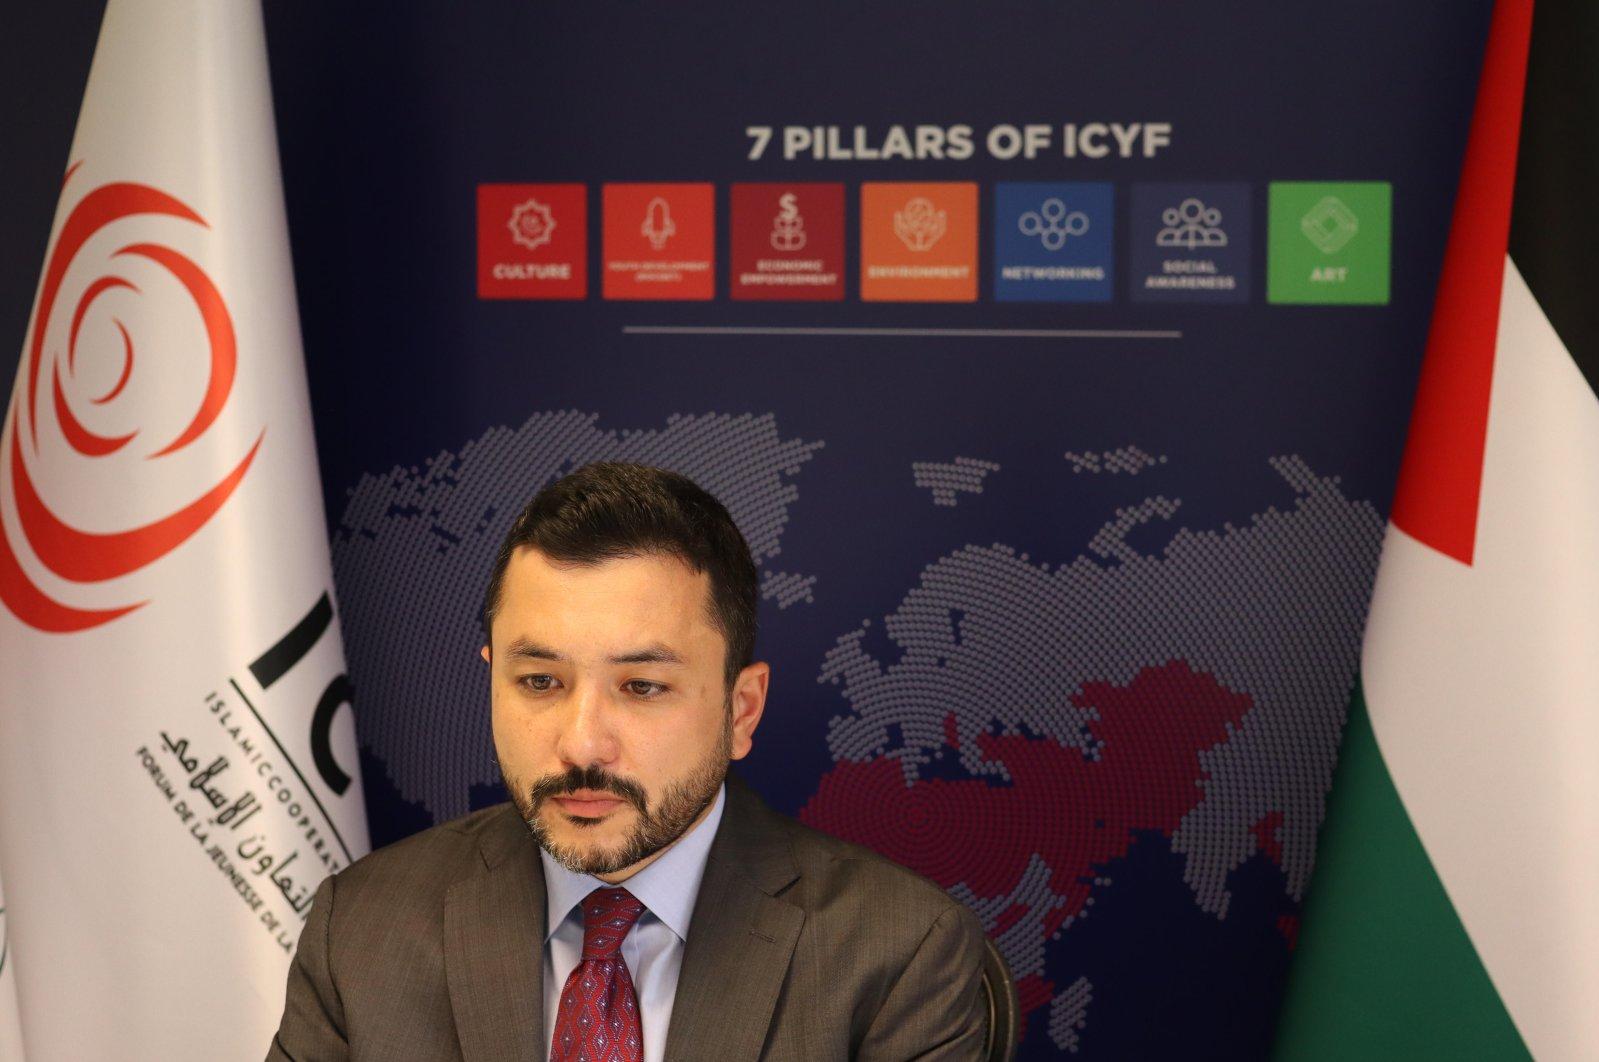 Islamic Cooperation Youth Forum President Taha Ayhan speaks during the webinar, June 2, 2021.